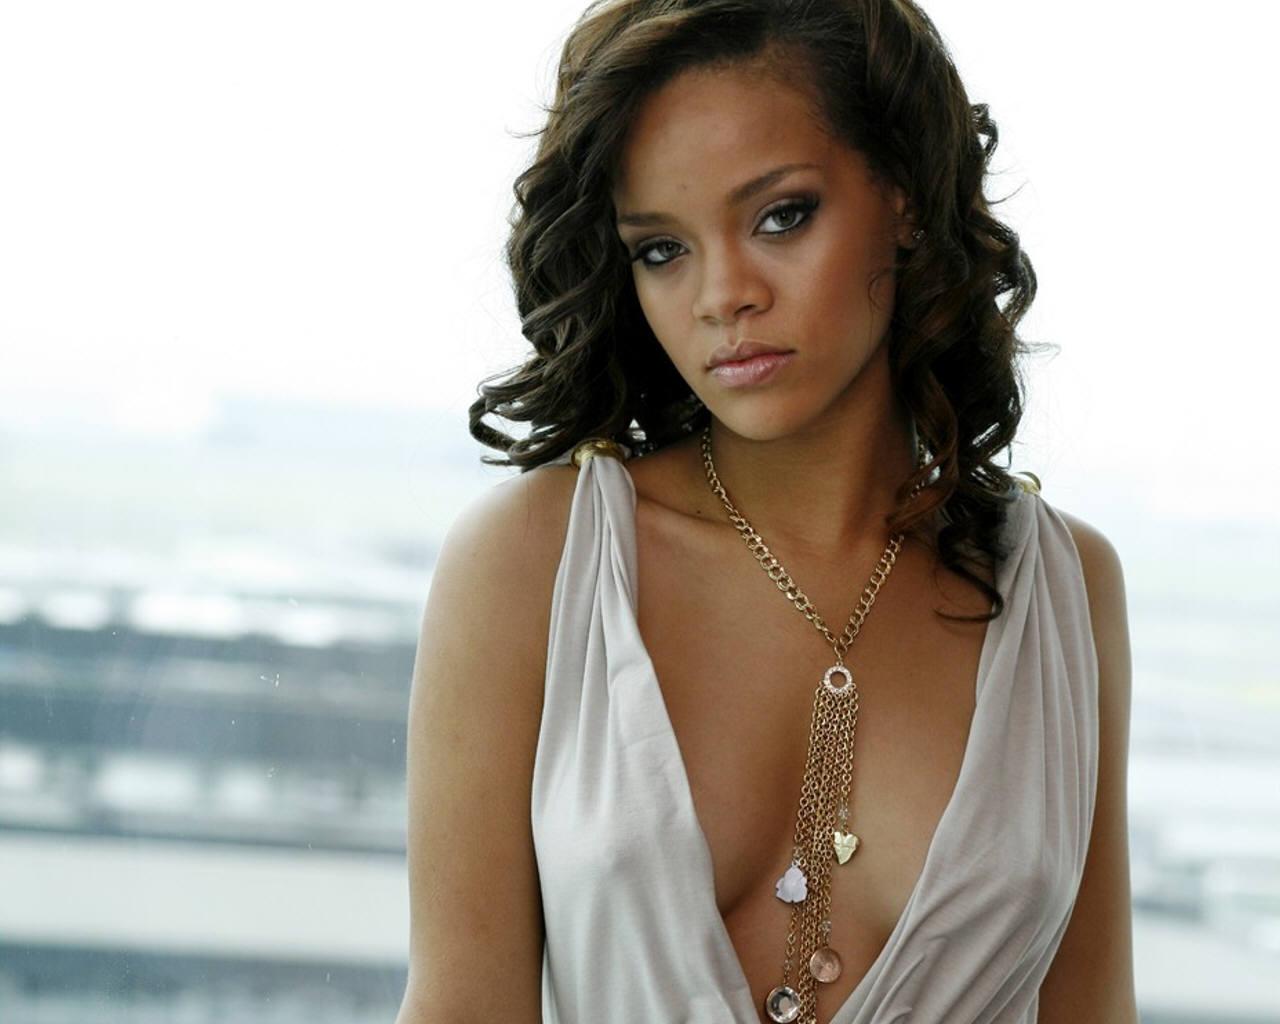 Rihanna to receive MTV lifetime achievement award